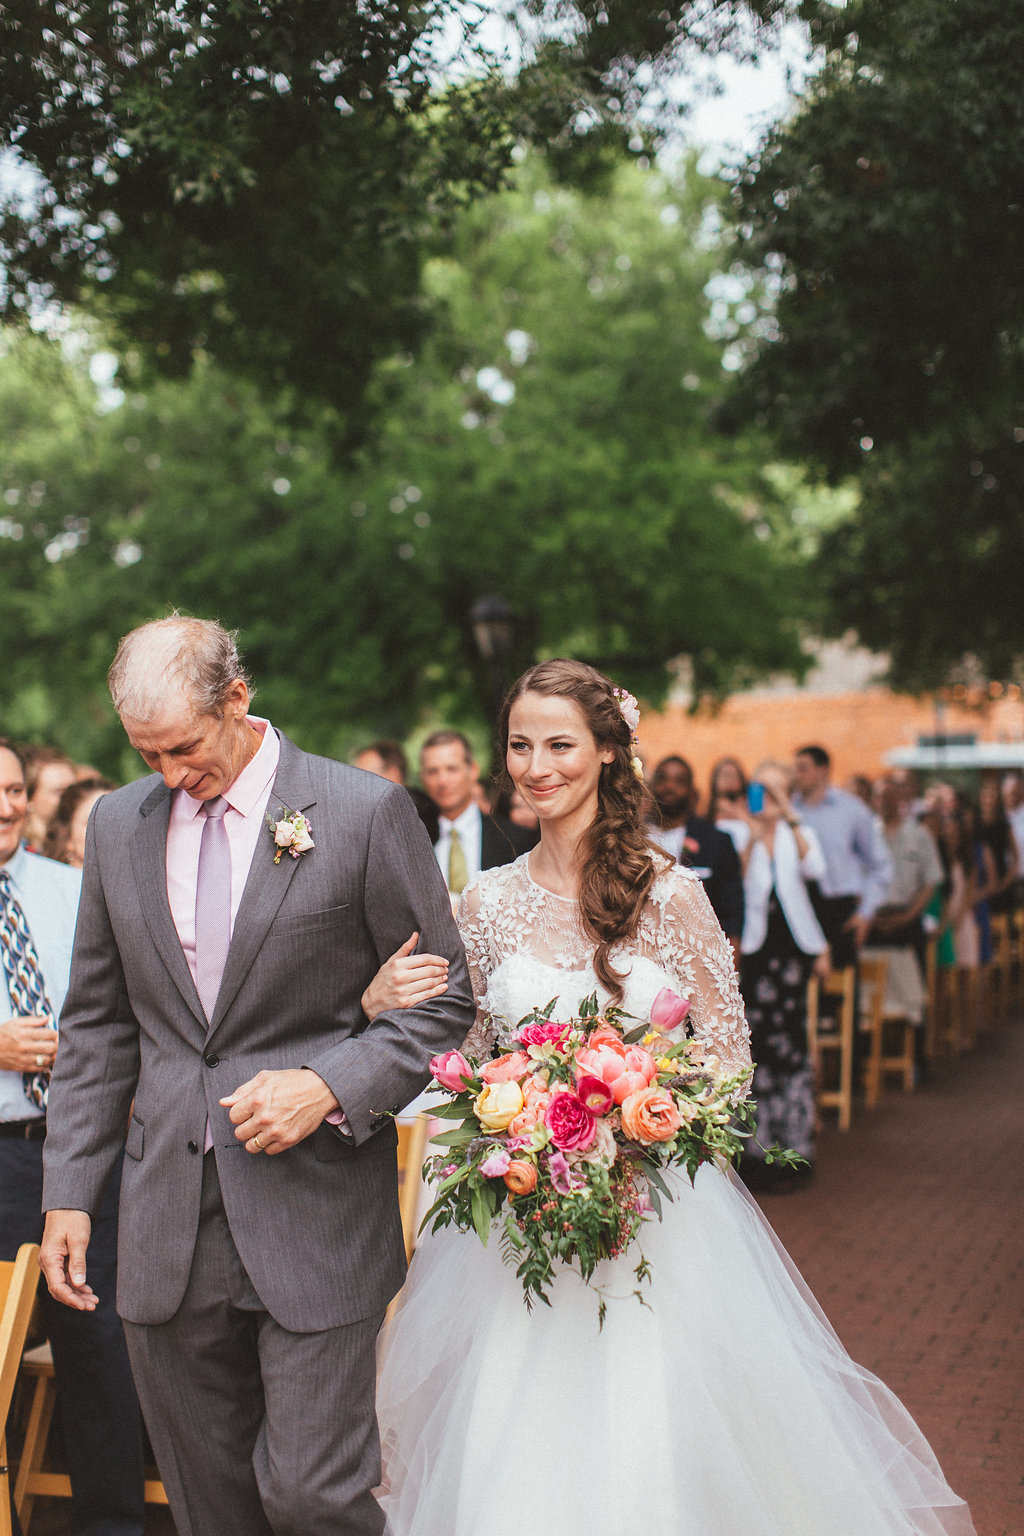 Walking down the aisle // bright, lush floral design in Dallas